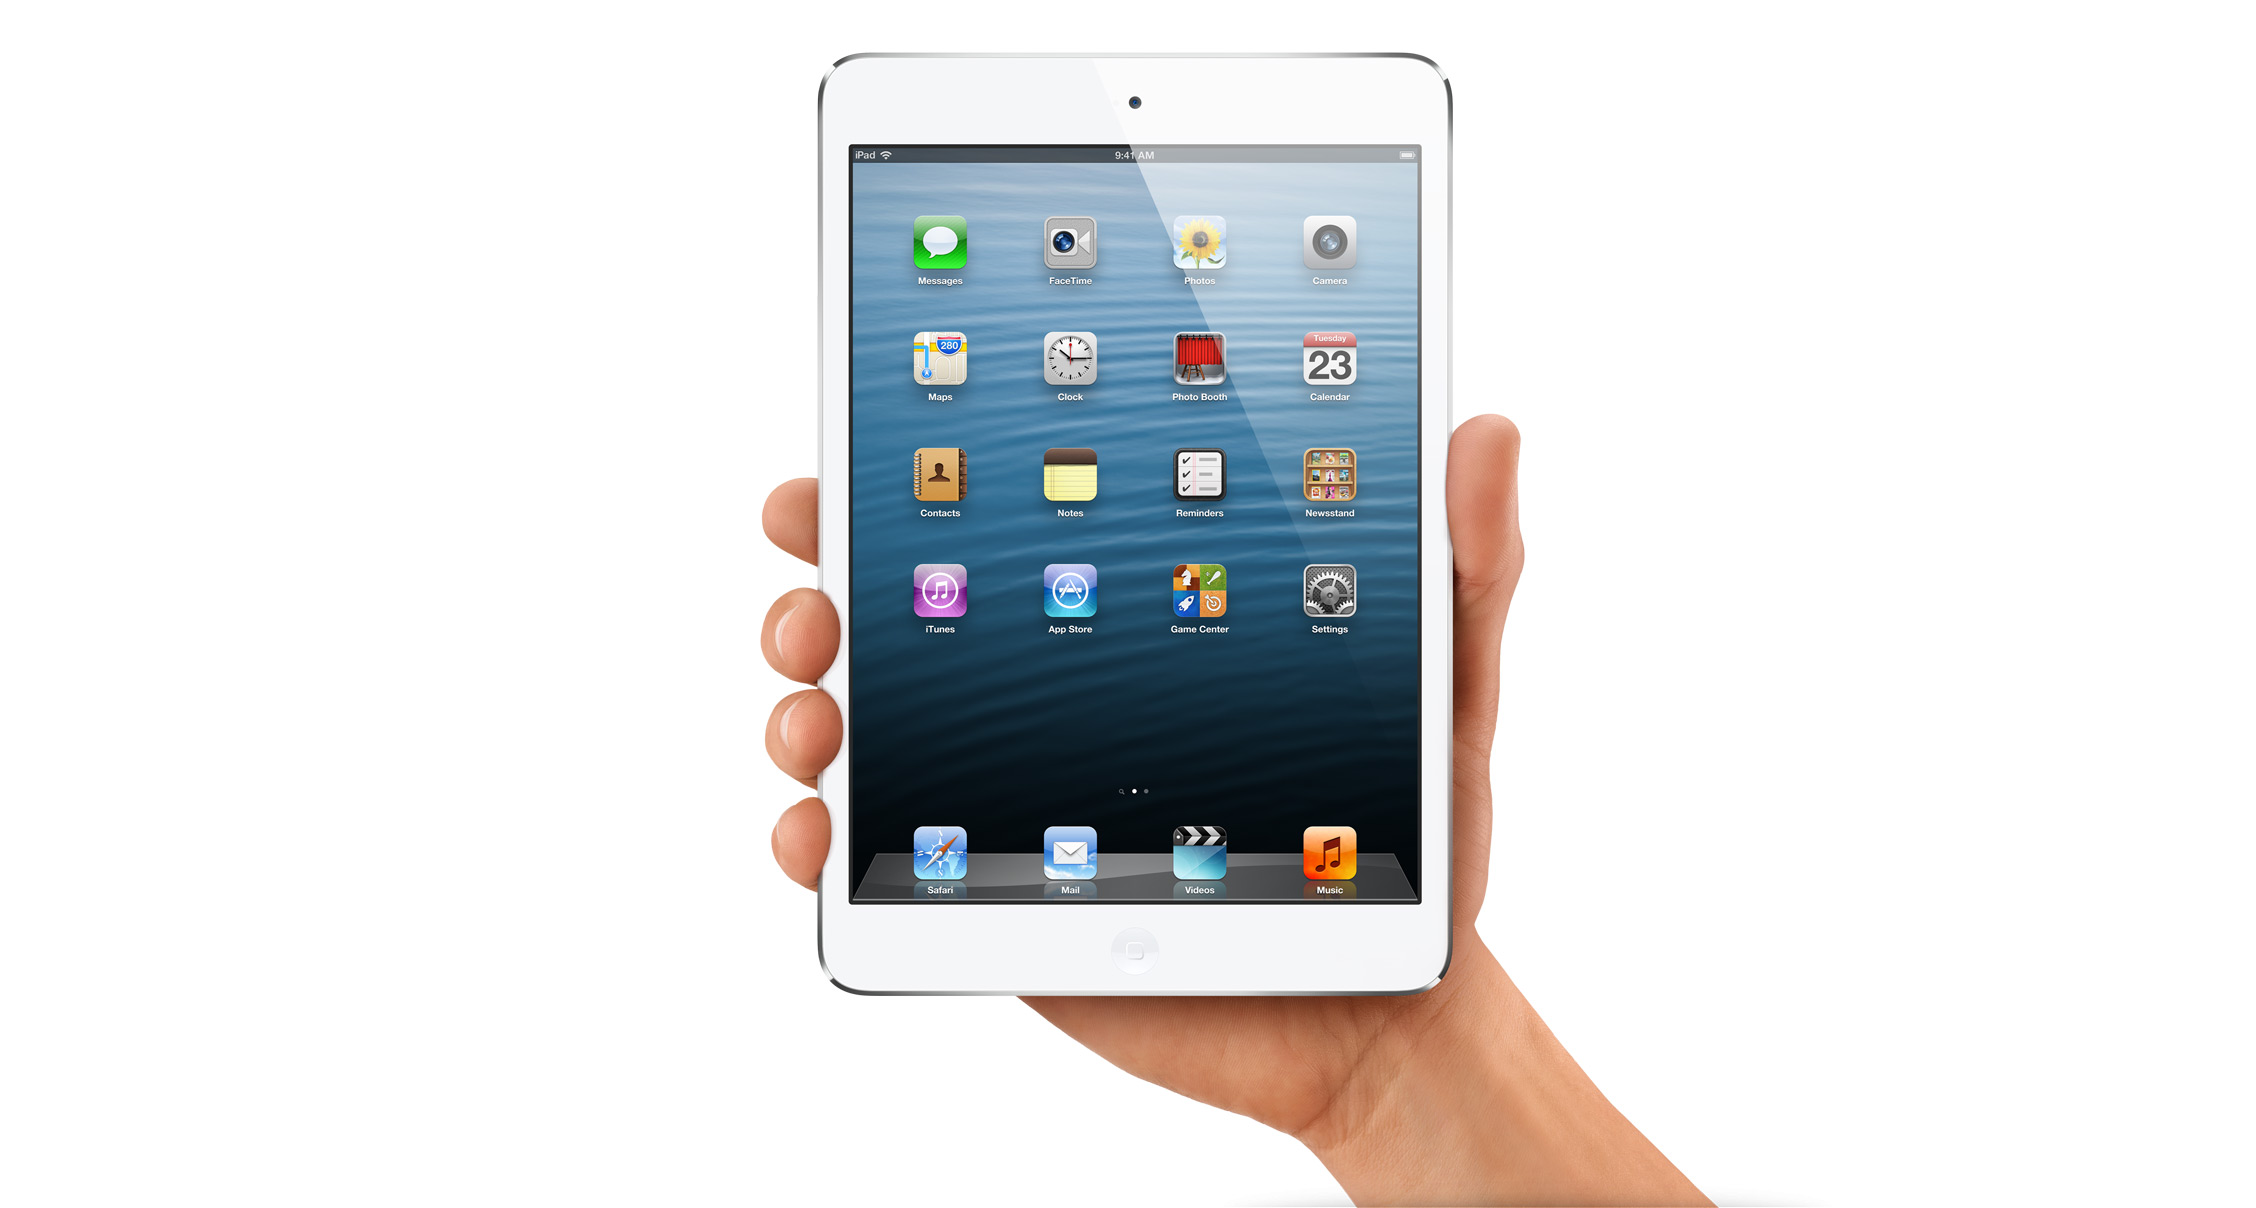 iPad Mini Wallpapers iPad Mini Wallpapers for Desktop Desktop 2256x1208